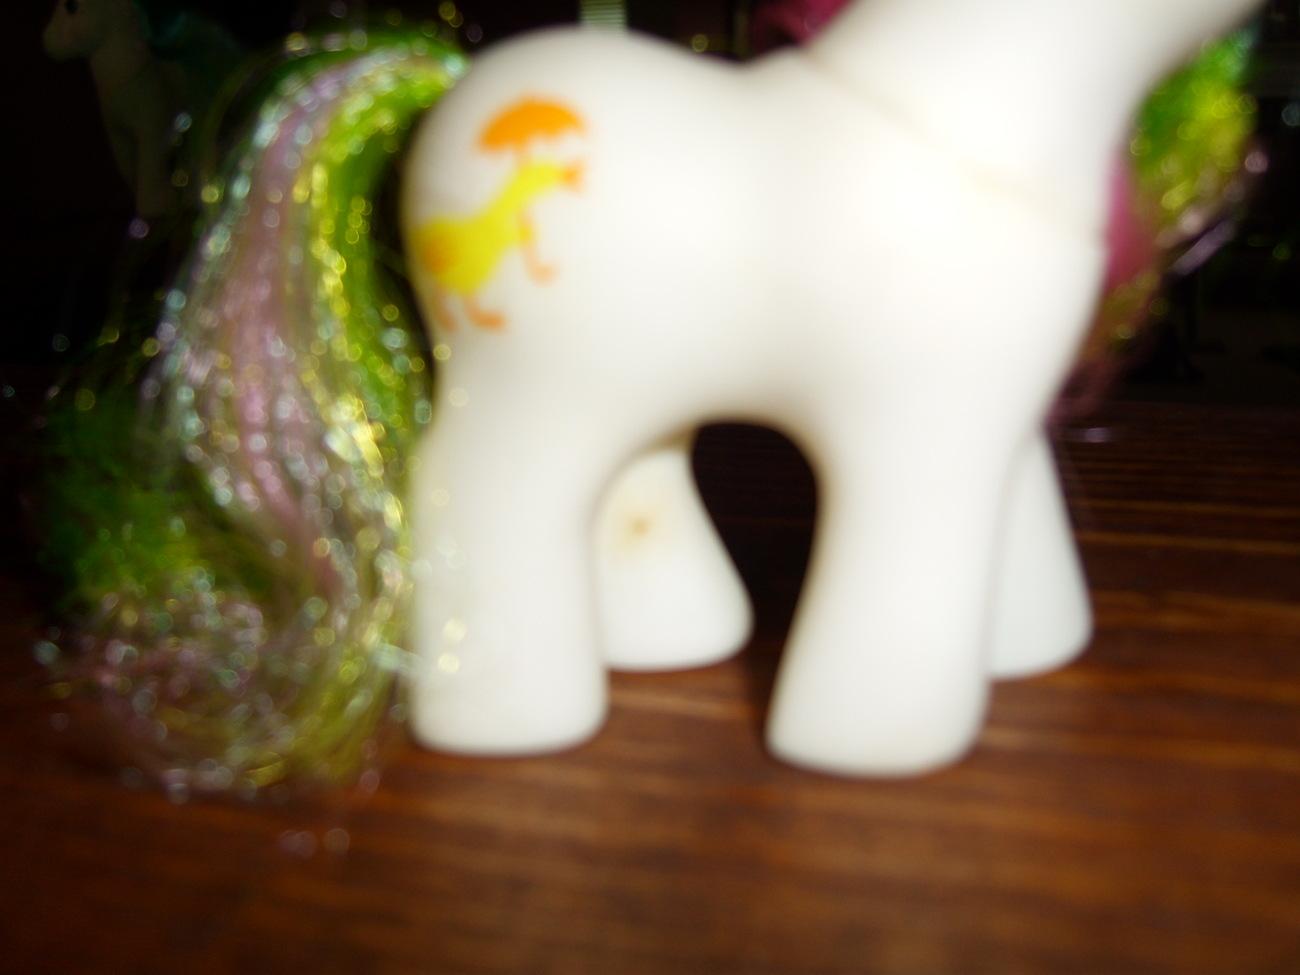 My Little Pony G1 FT Baby Quackers